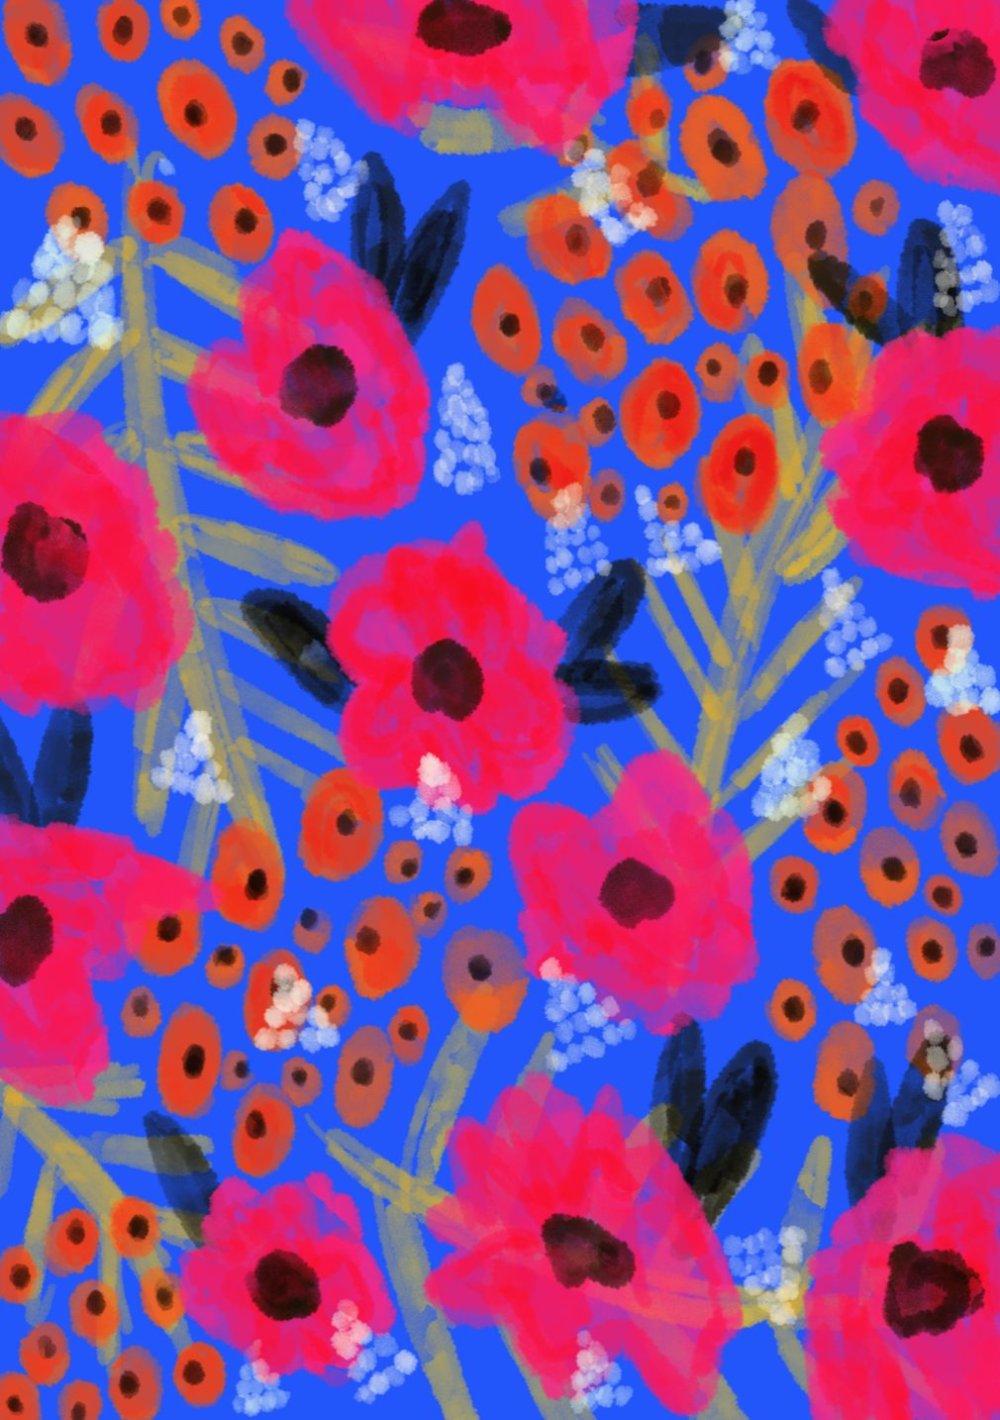 Gorgeous And Colorful Floral Illustrations By Rafaela Mascaro 6